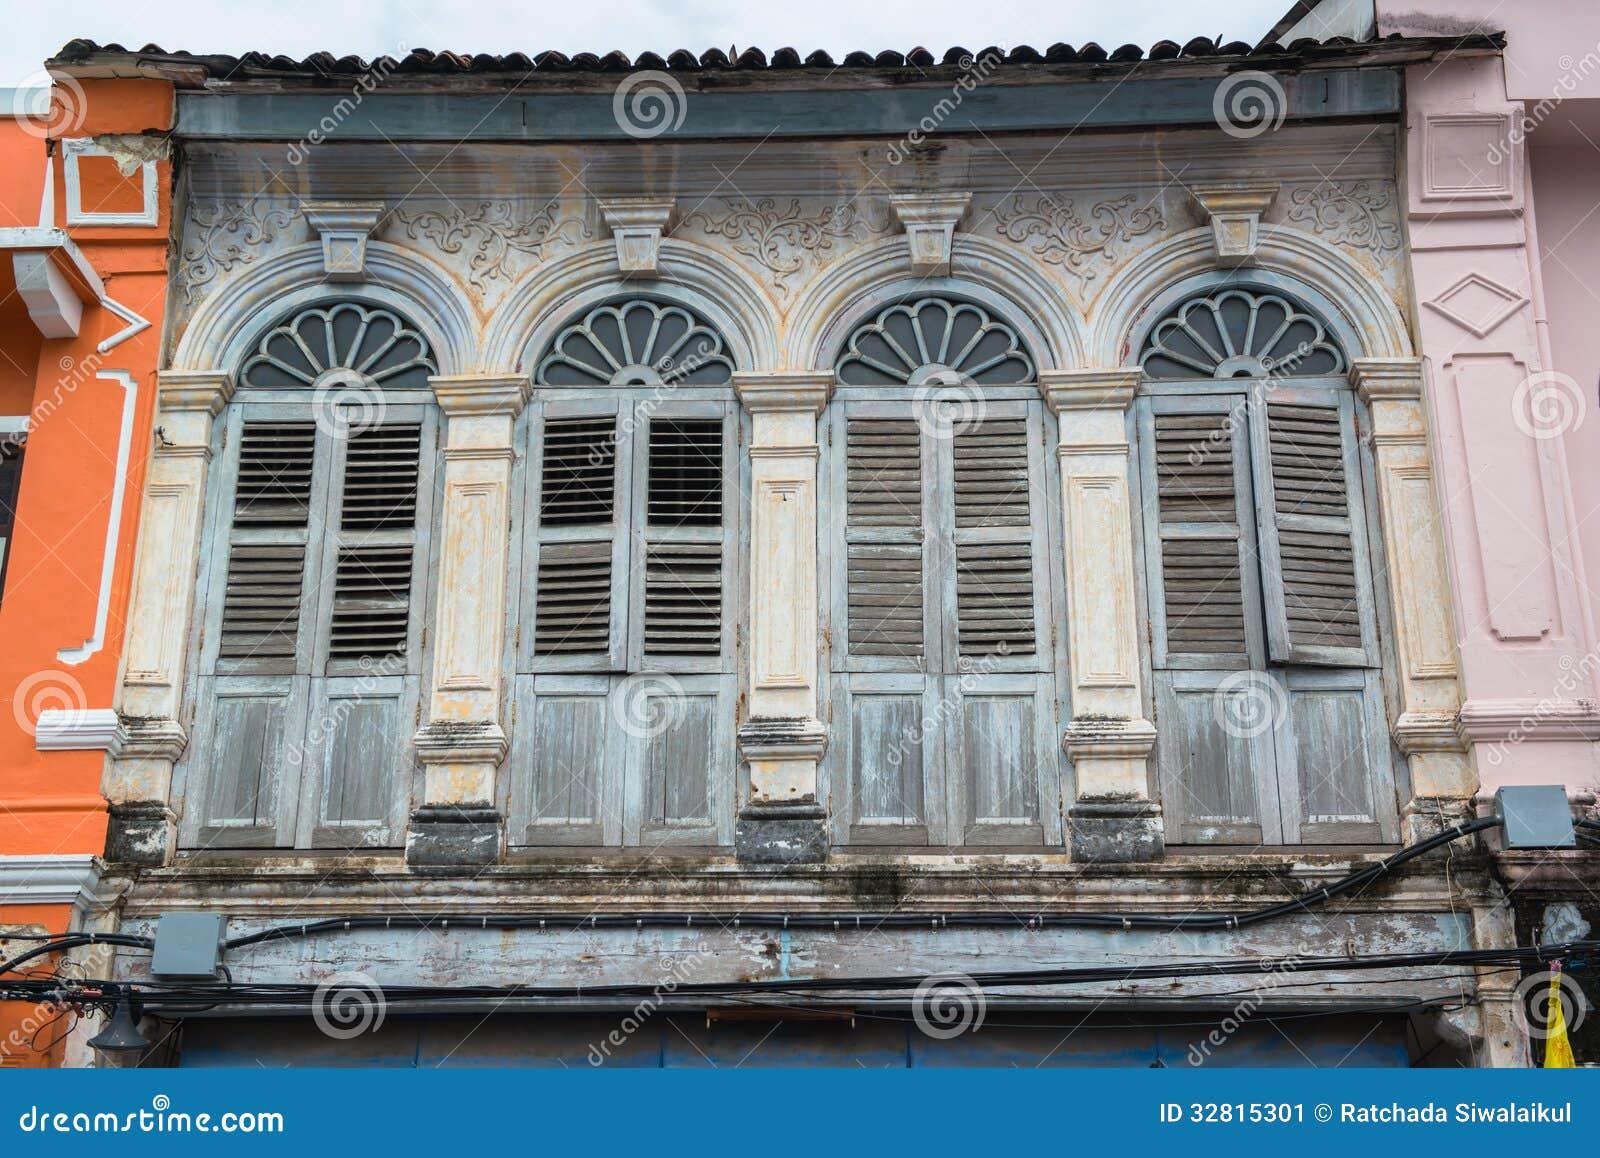 The European Retro Style Old Windows Stock Image Image